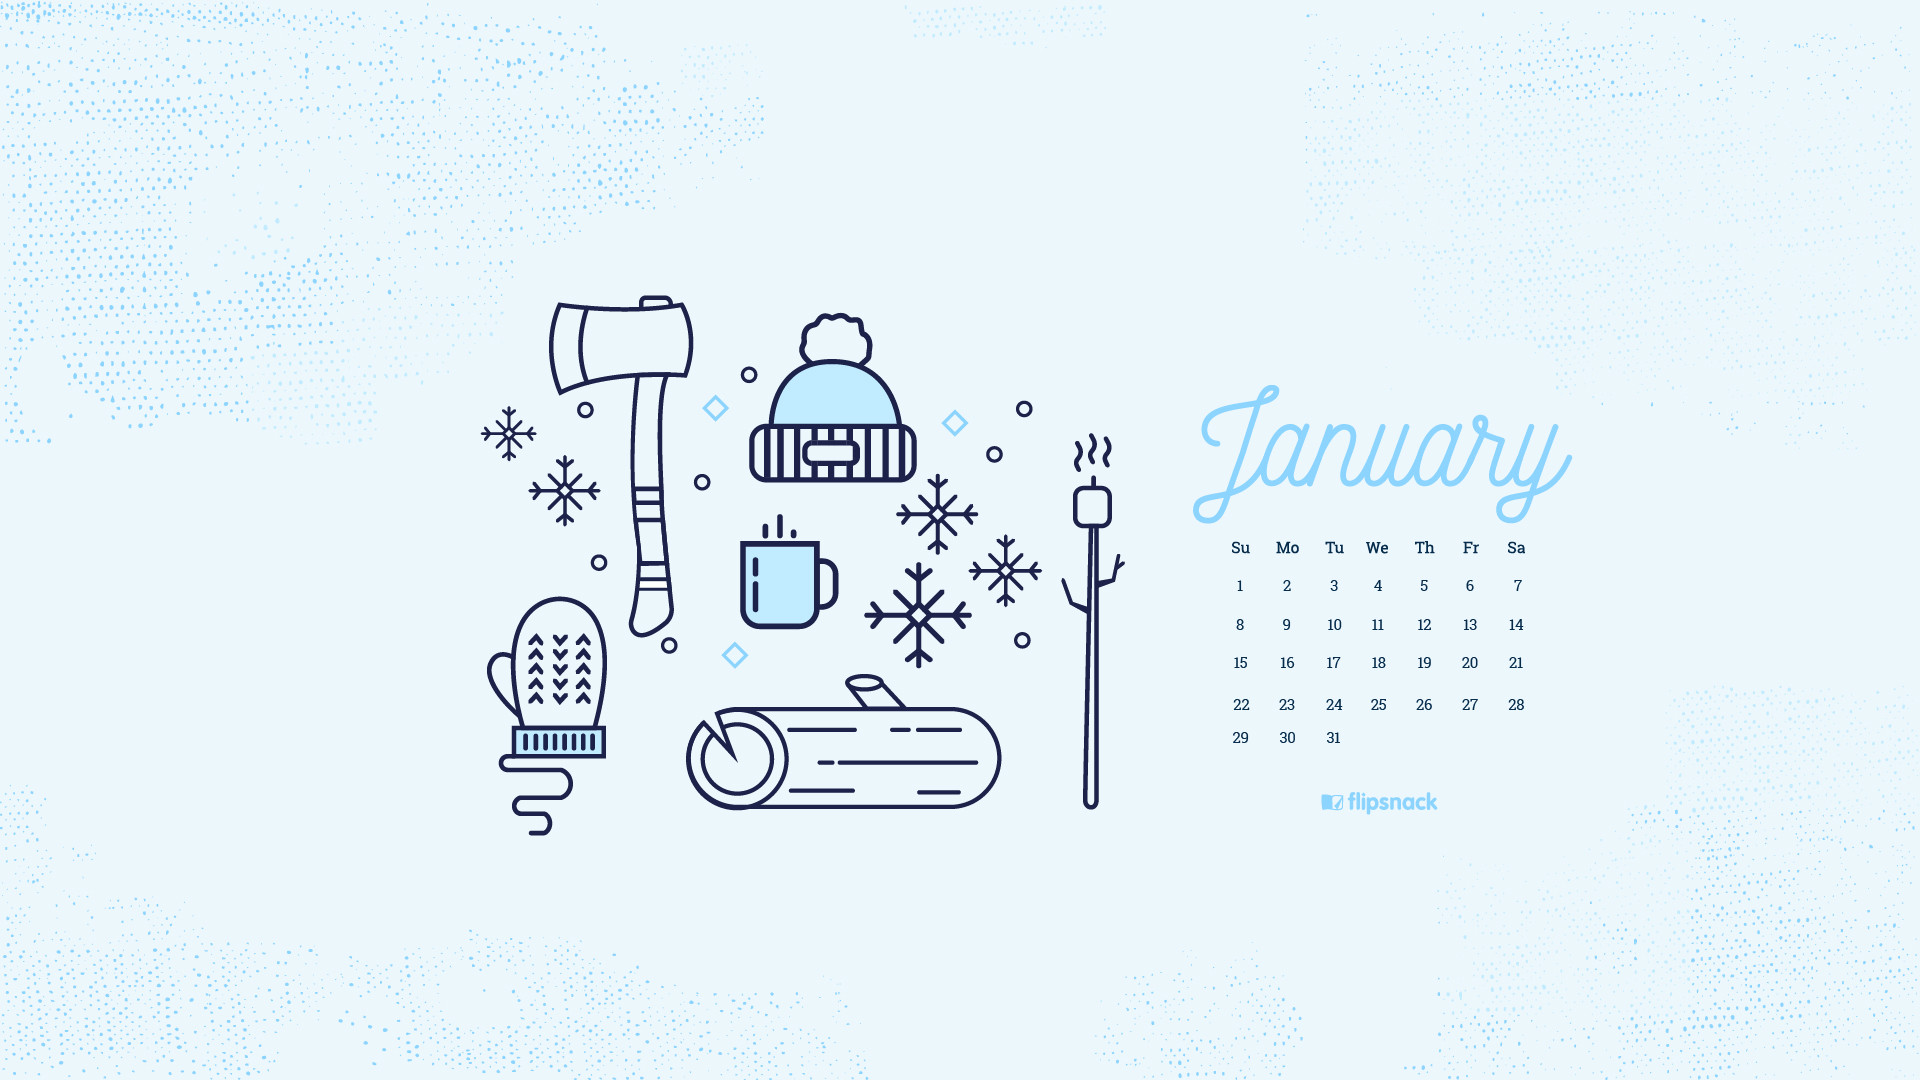 Desktop Wallpapers Calendar December 2018 183 ①